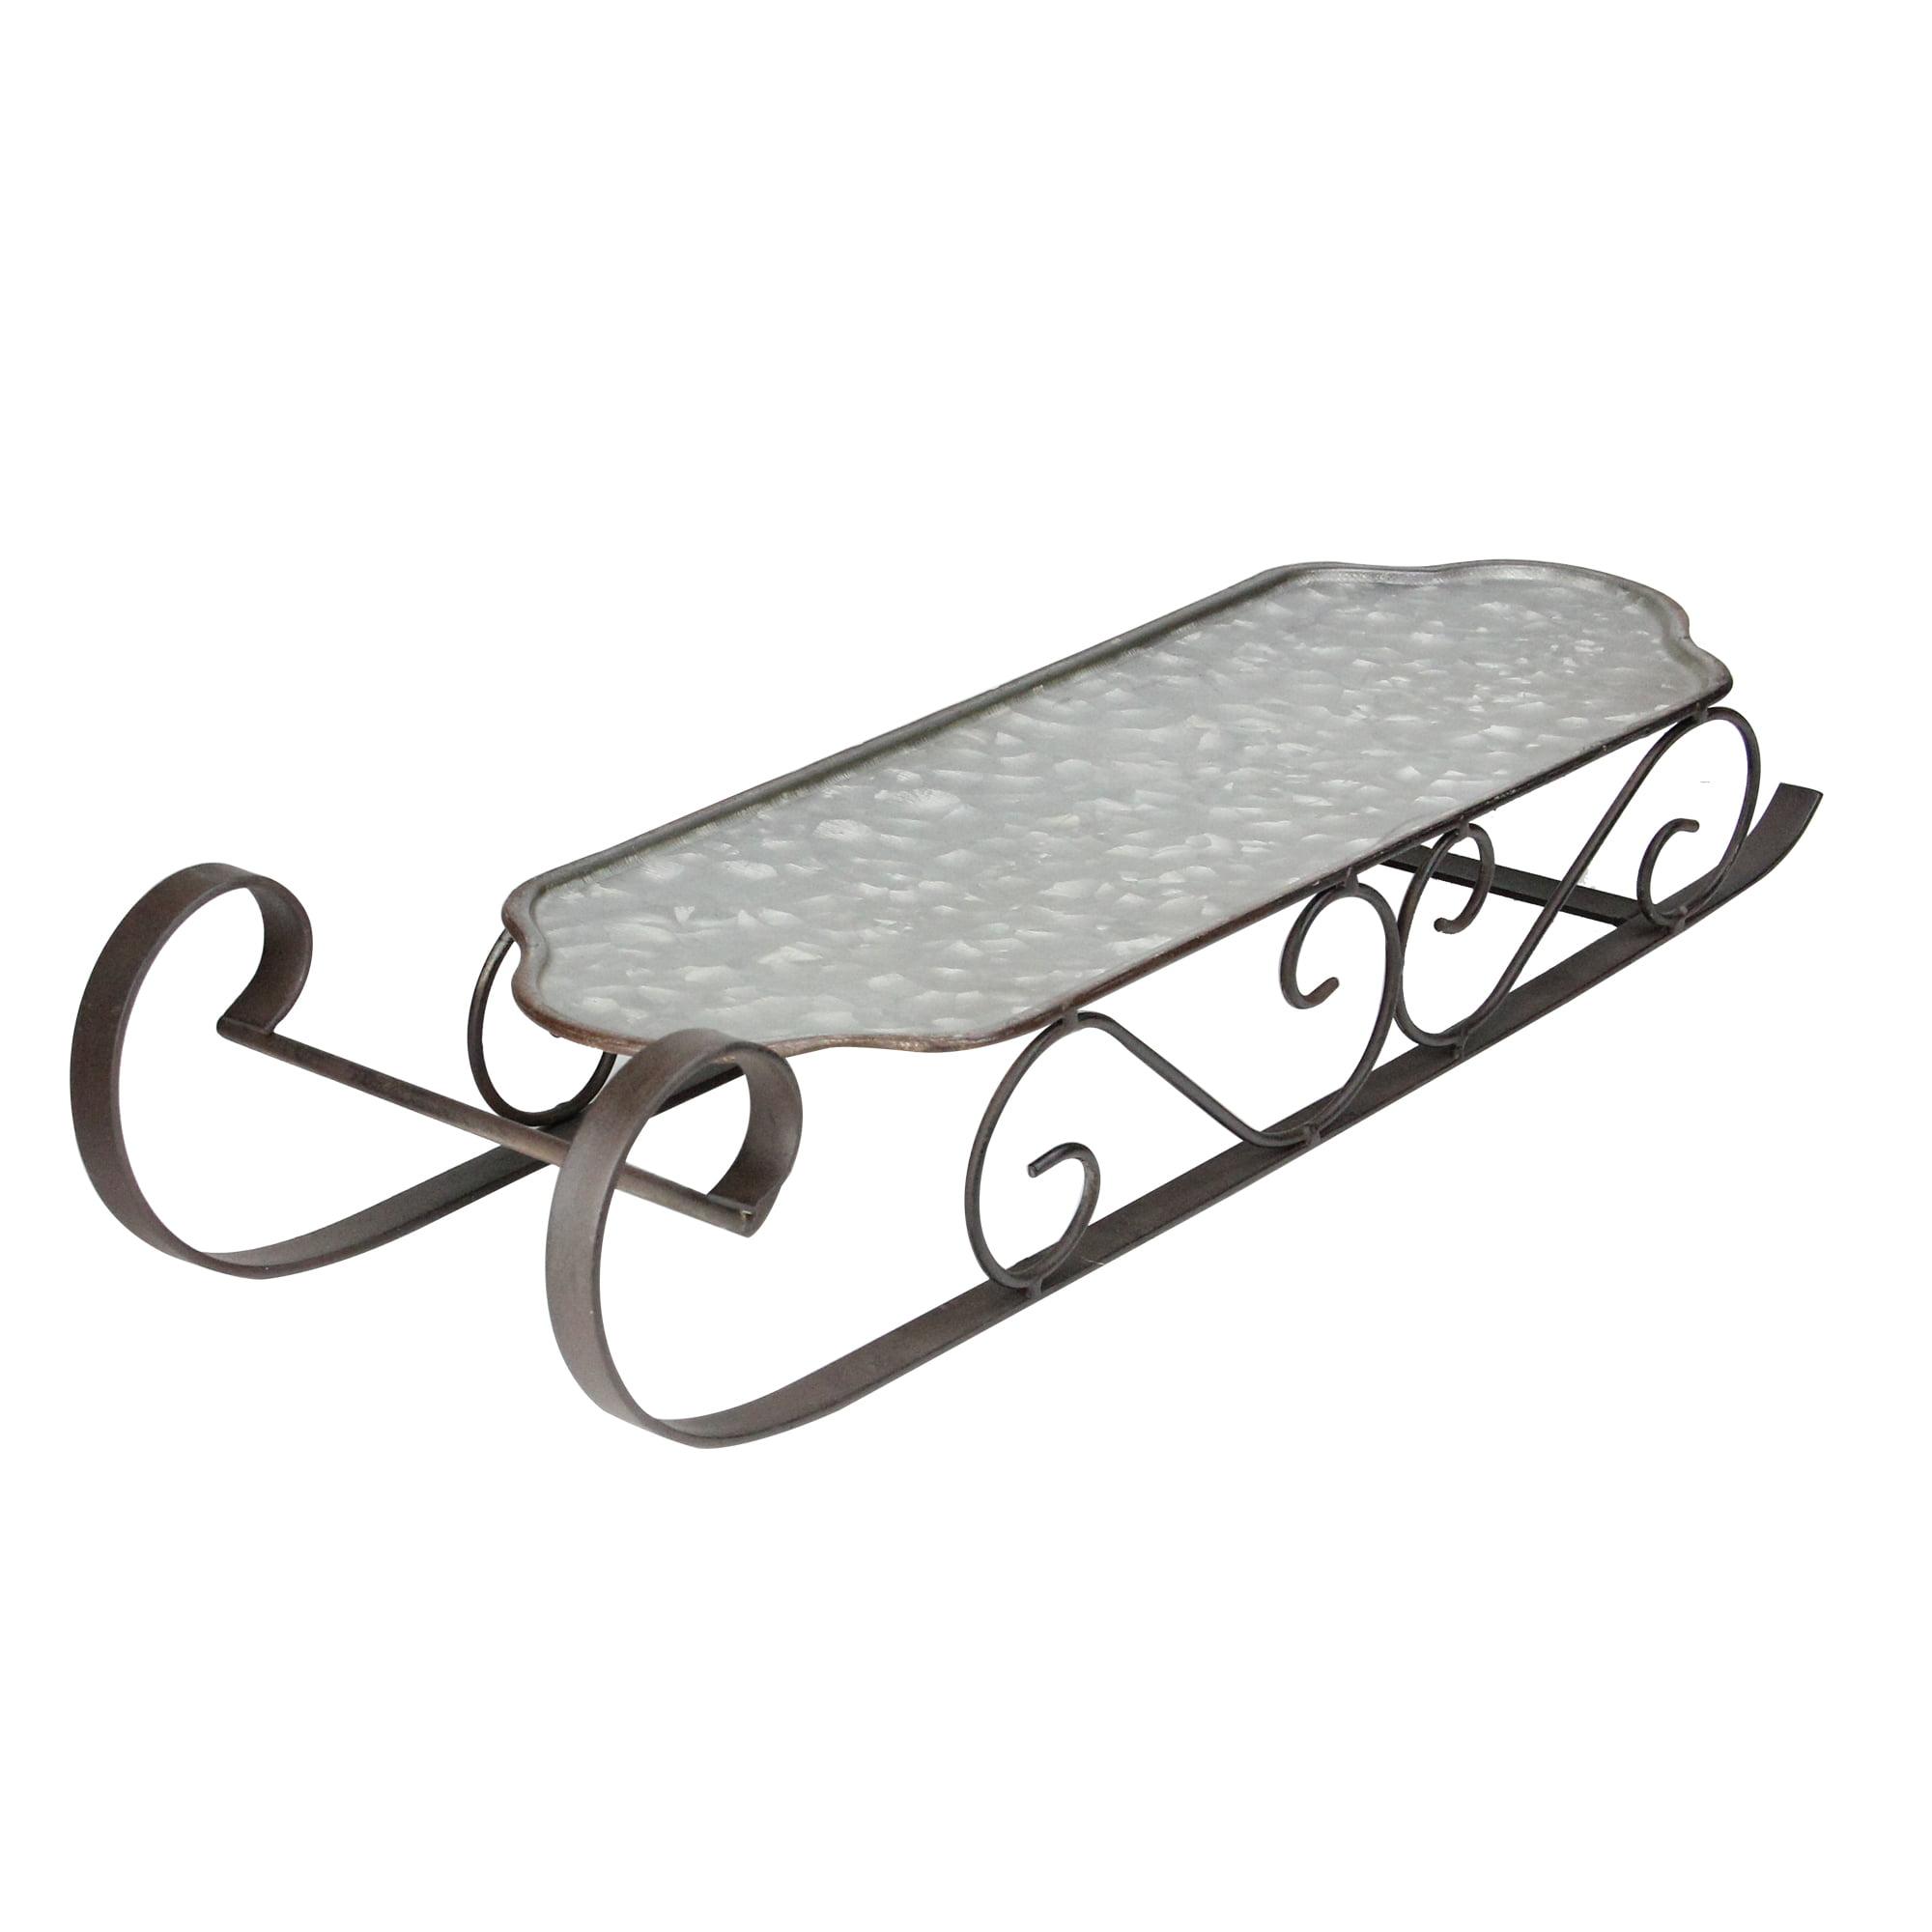 "Ganz 22"" Galvanized Metal Christmas Sled Table Centerpiece - Gray/Black"